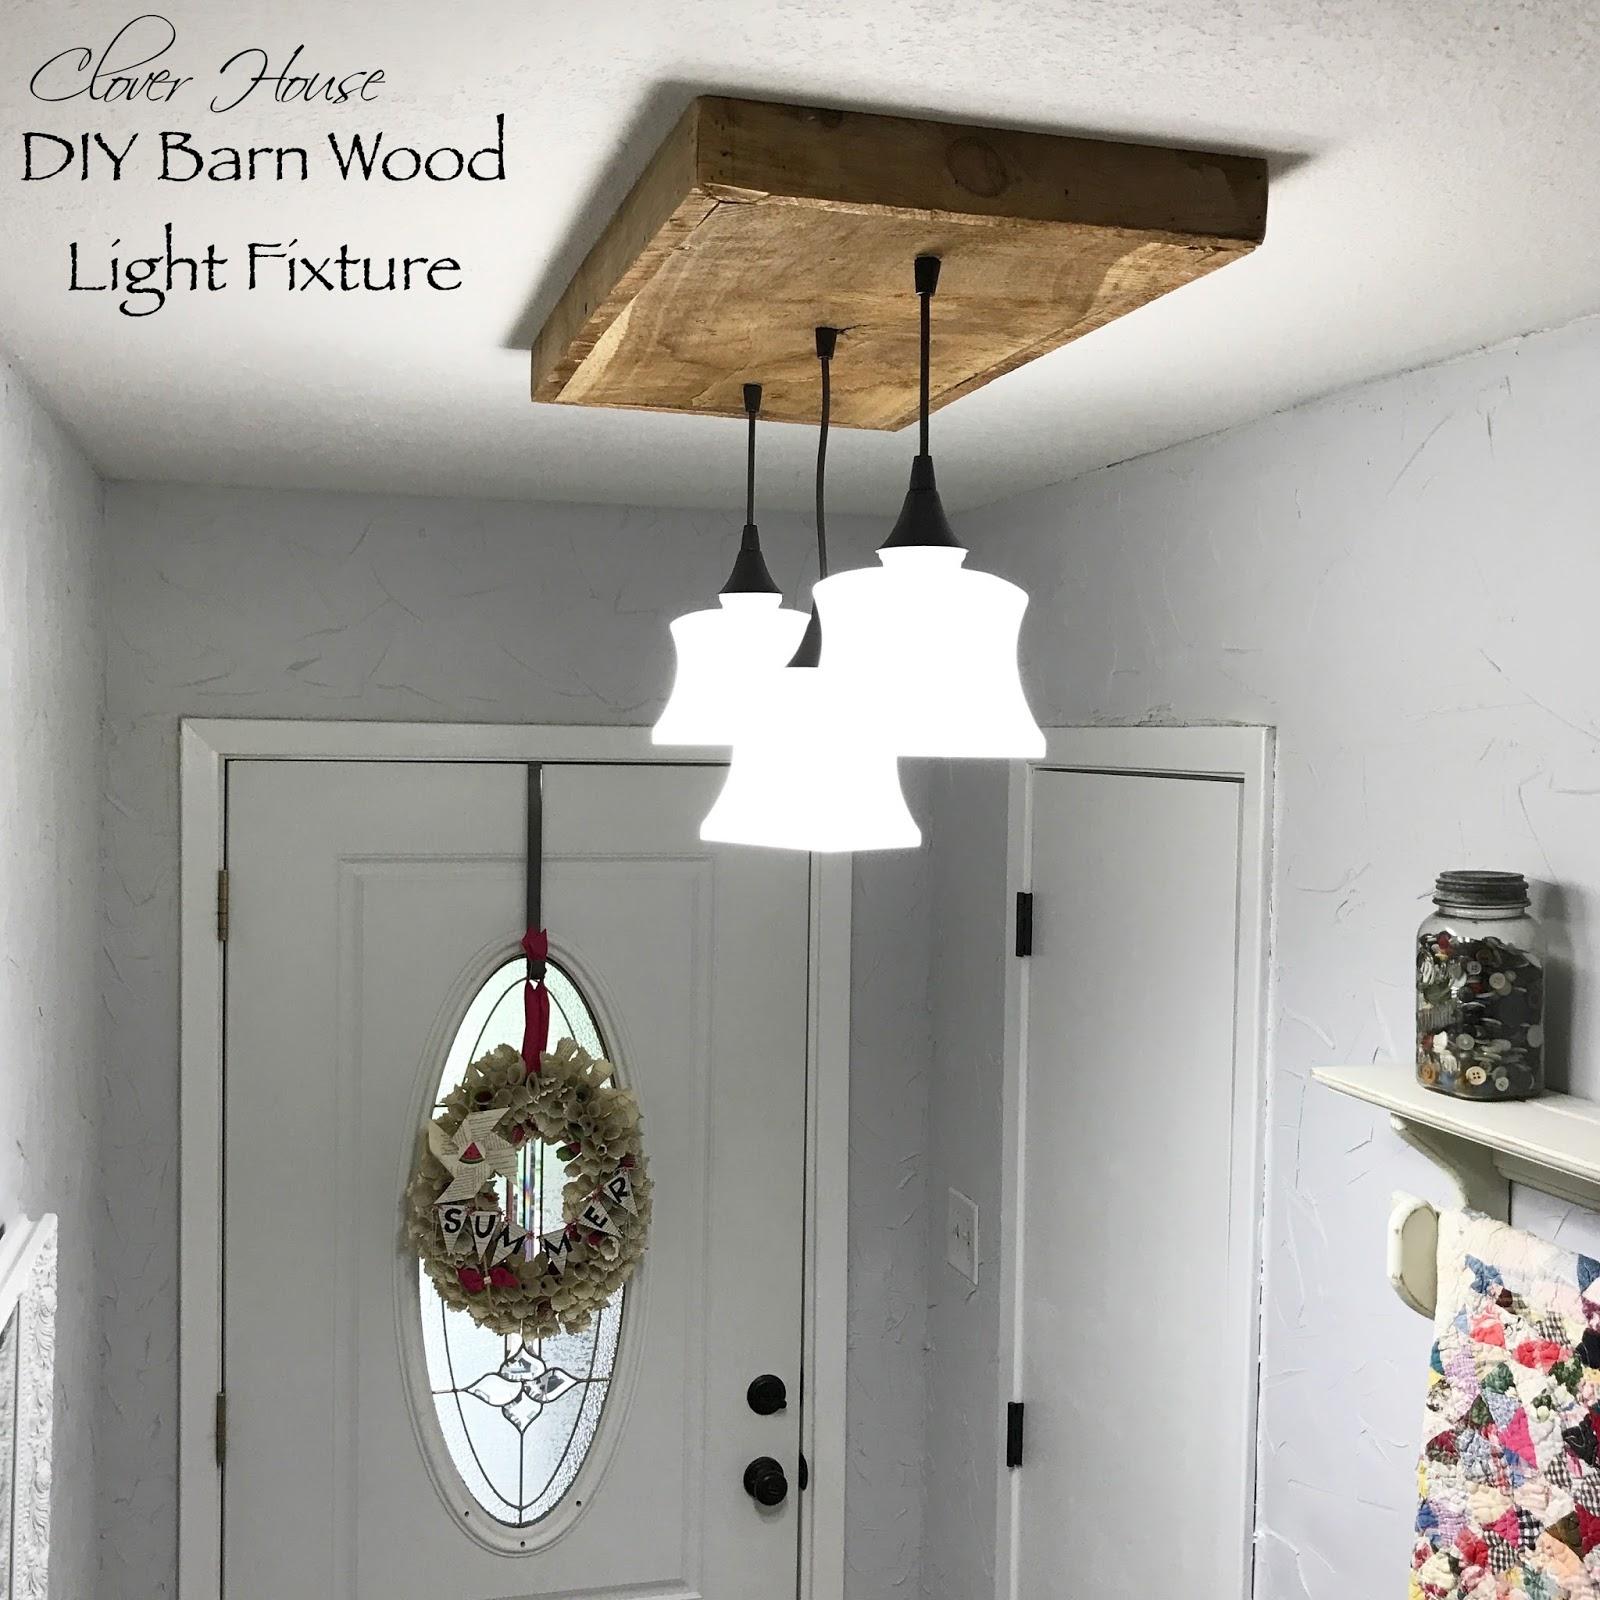 Clover House Diy Barn Wood Light Fixture